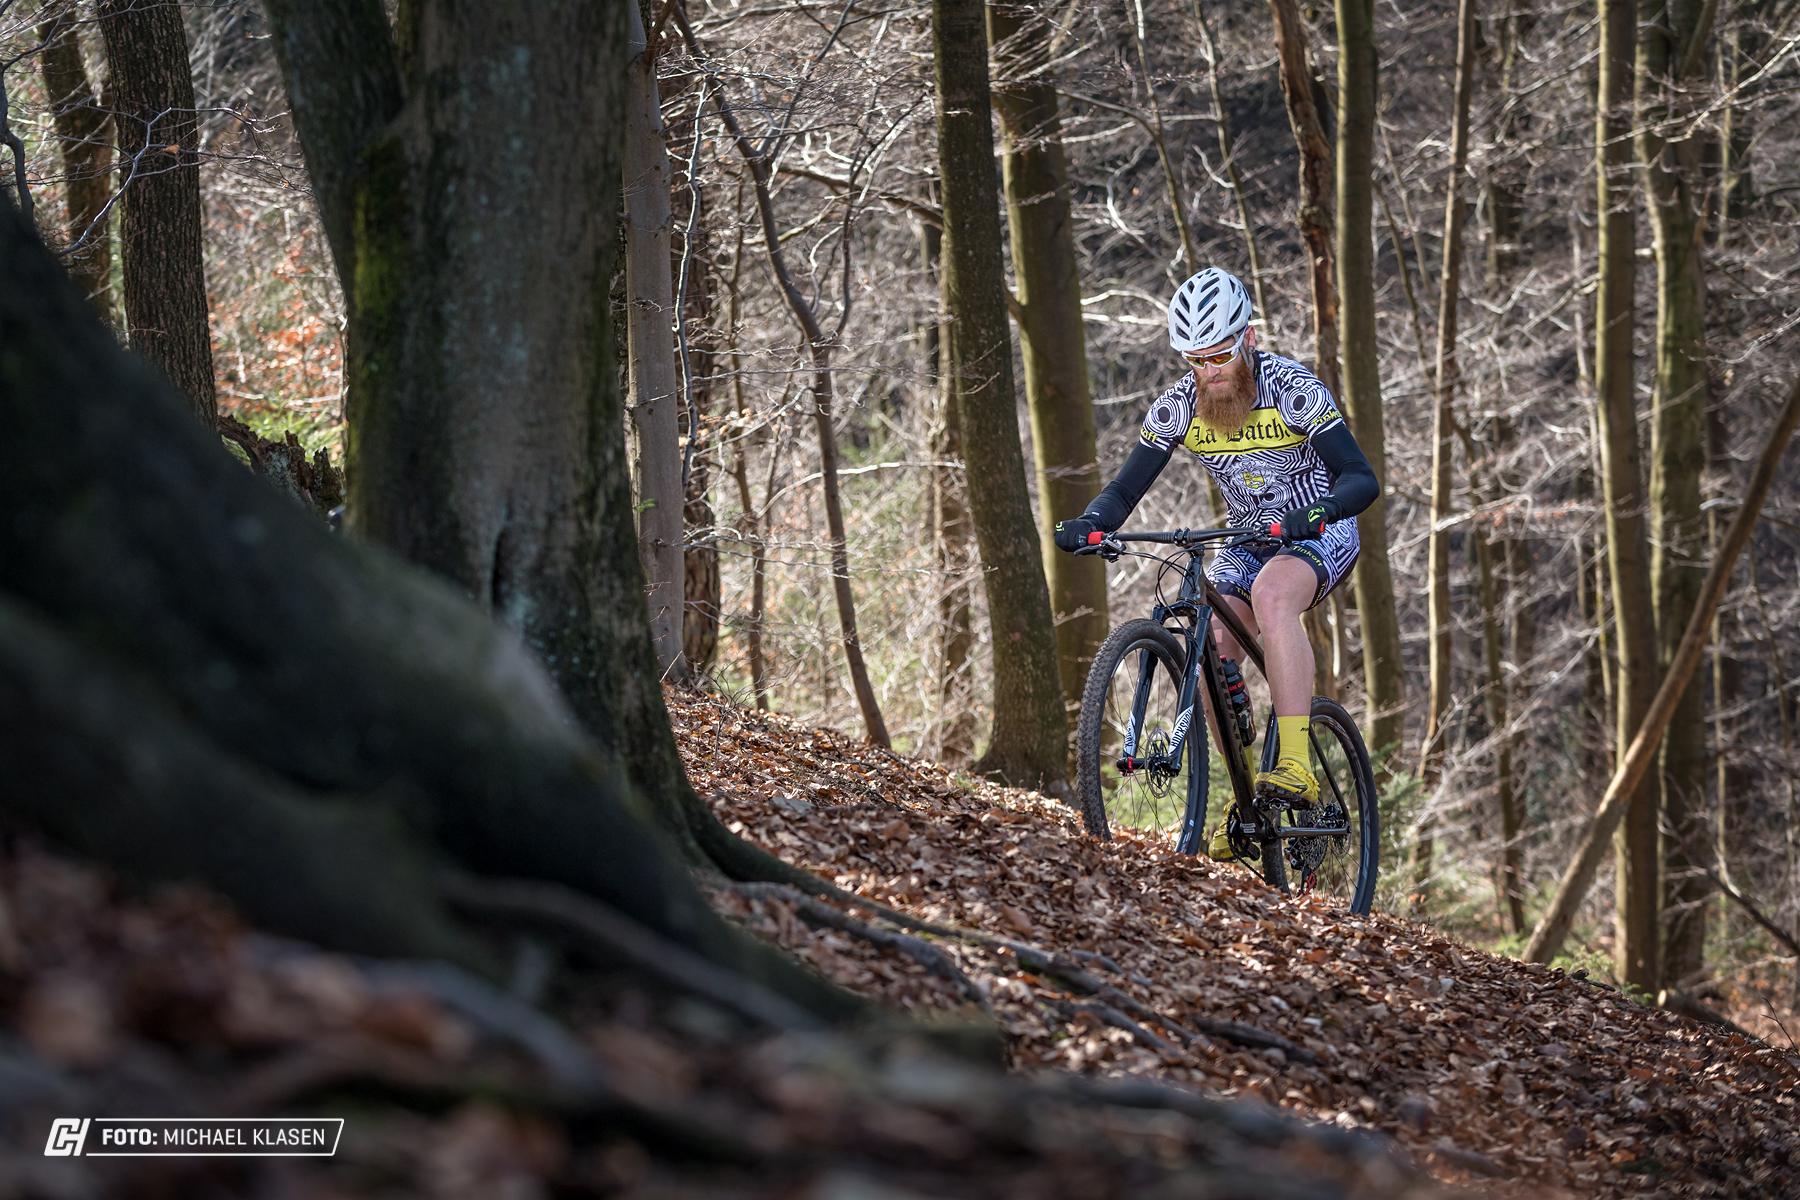 MIK 8369 Cycleholix